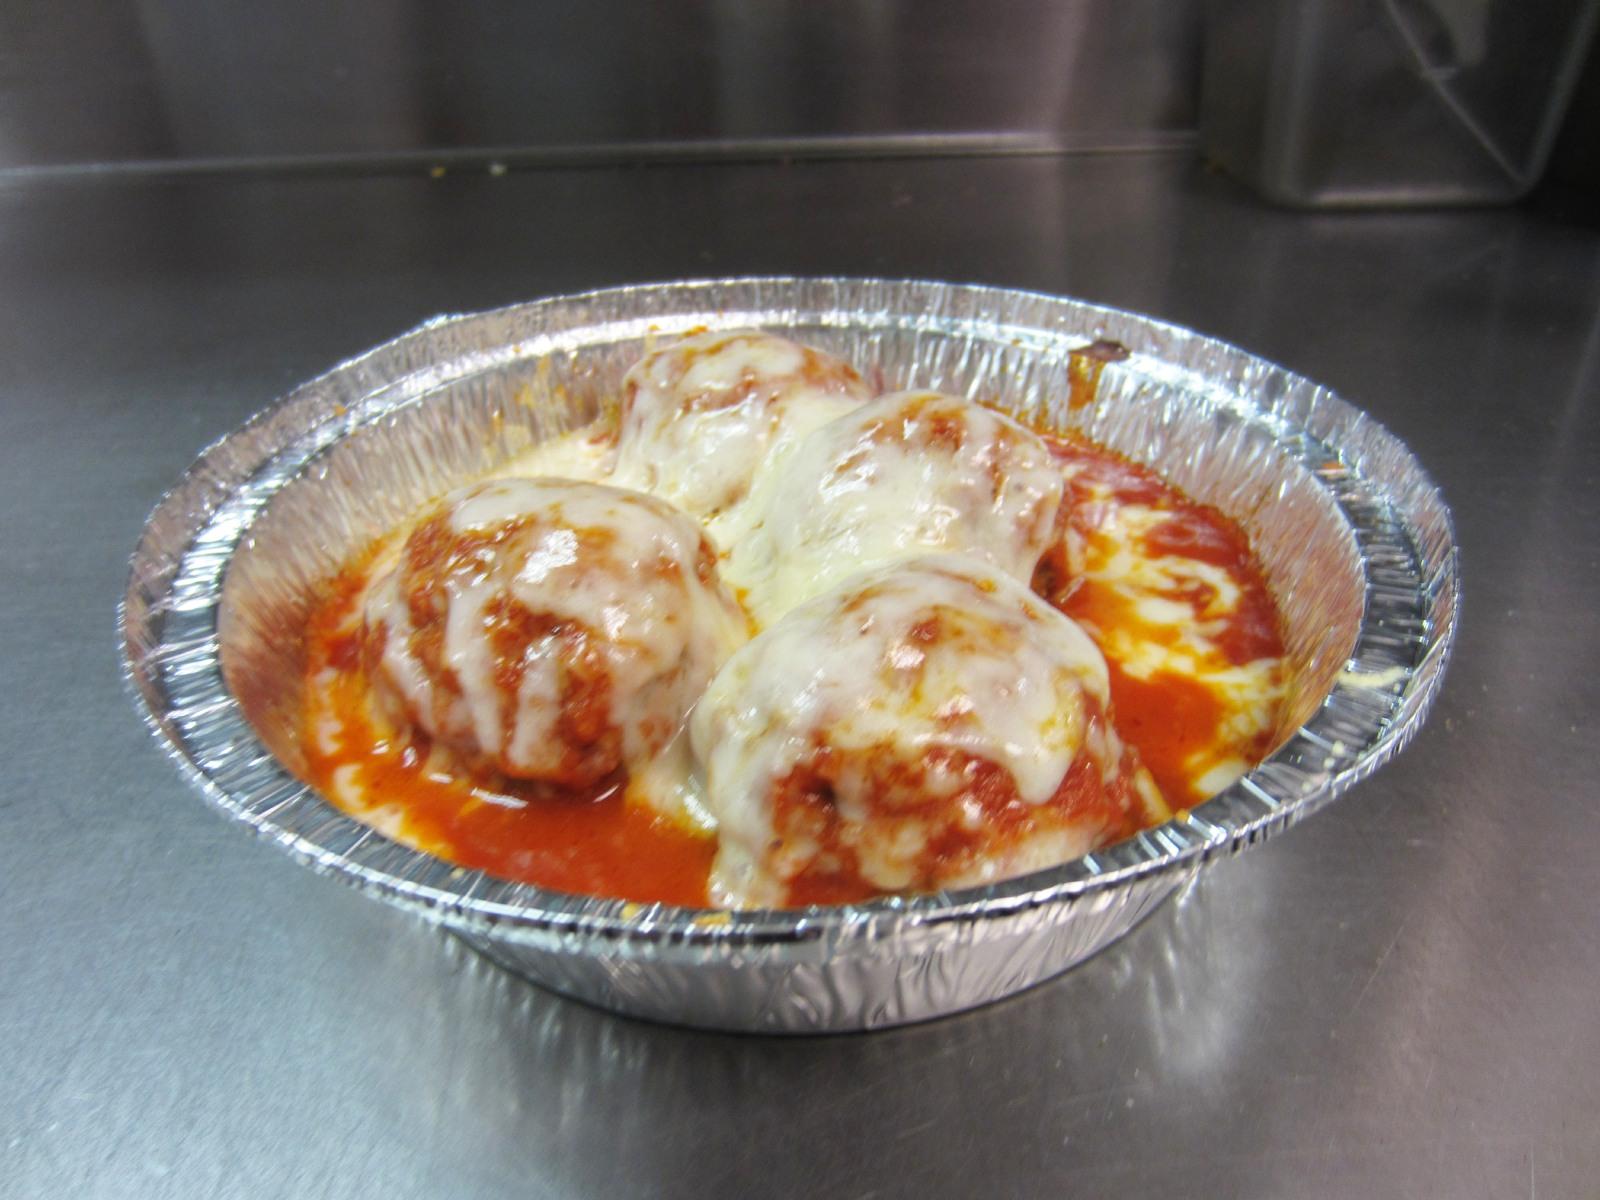 Side of Meatballs (4) Image